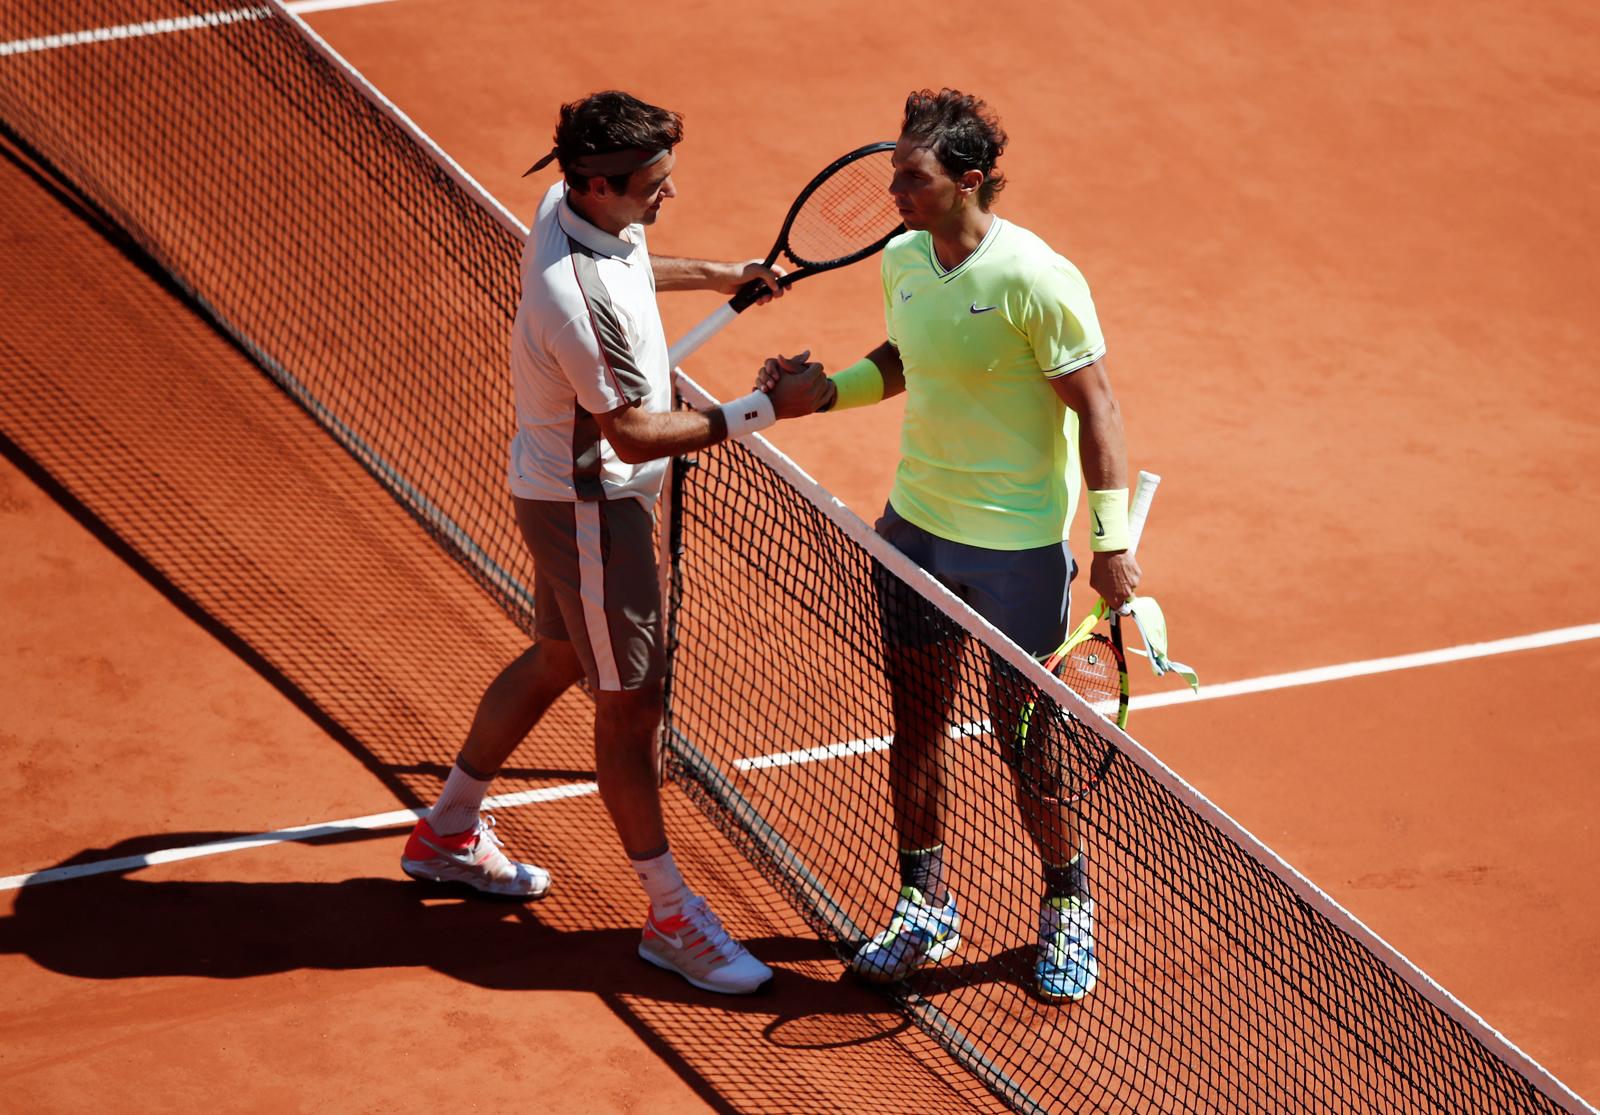 Switzerland's Roger Federer congratulates Spain's Rafael Nadal after their semifinal match. Reuters